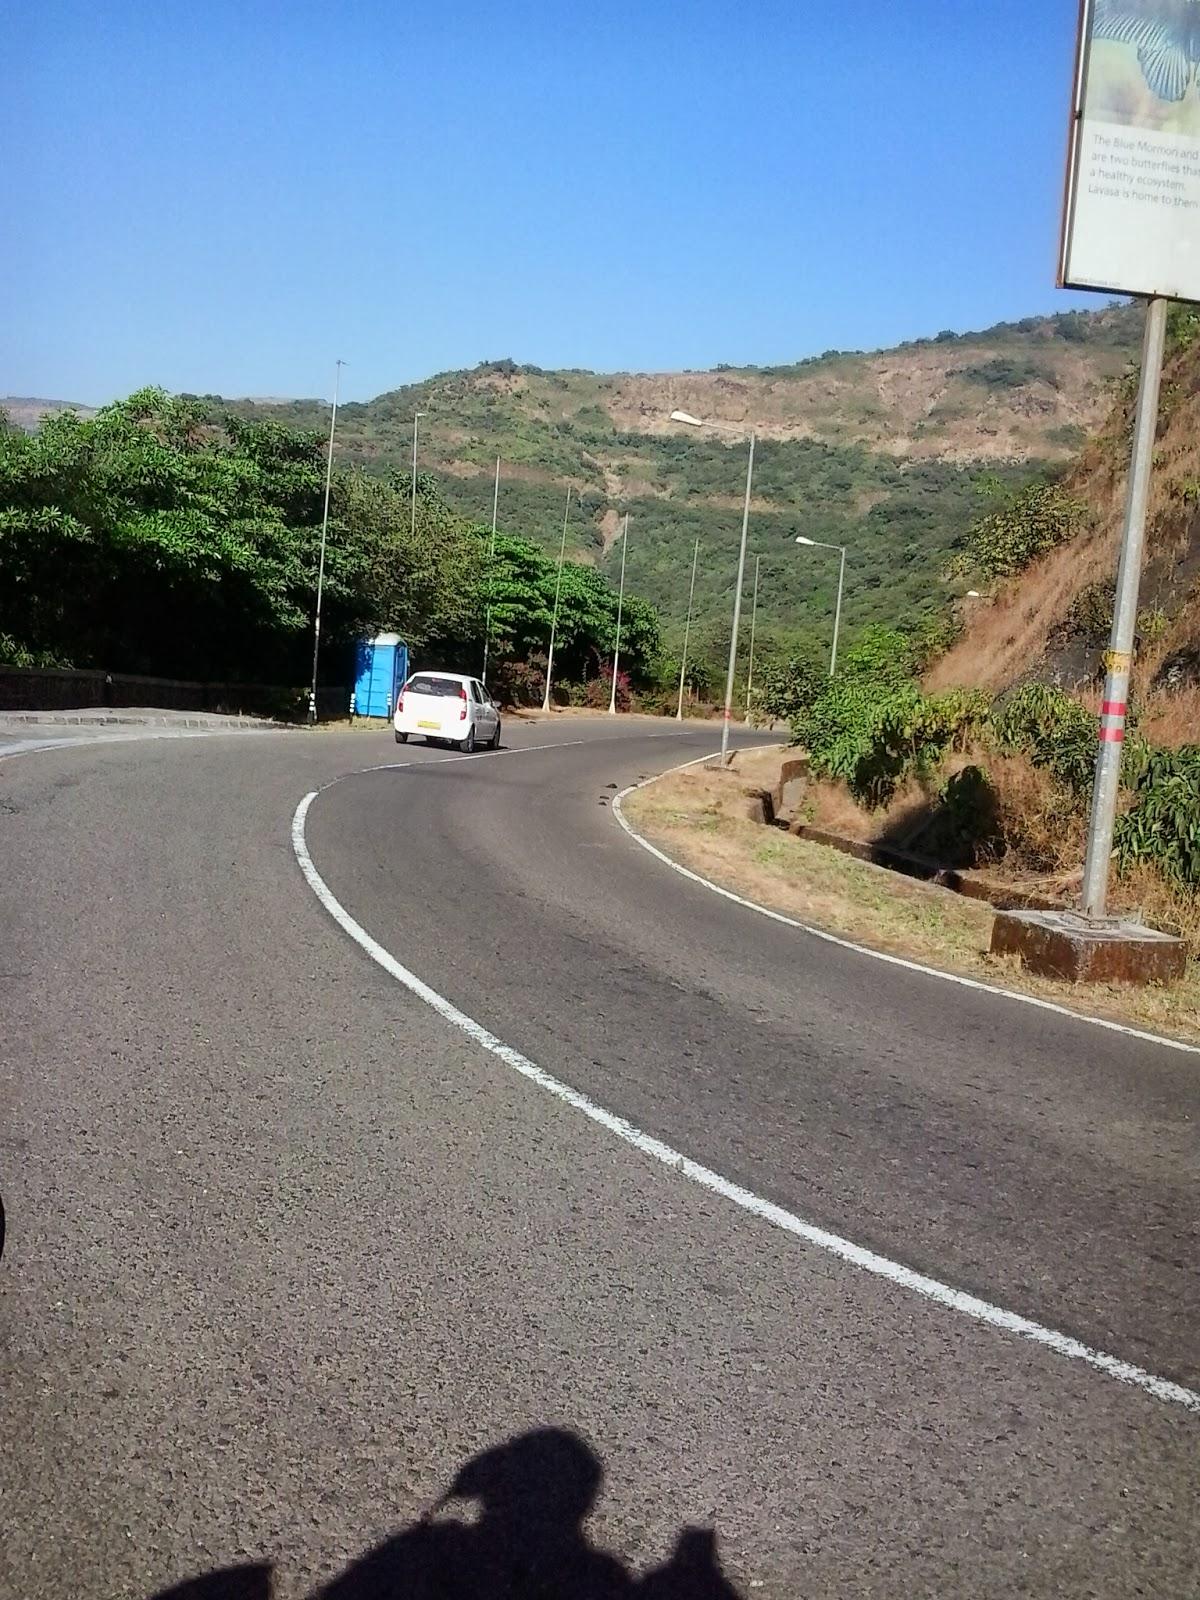 Short ride to lavasa city, Pune